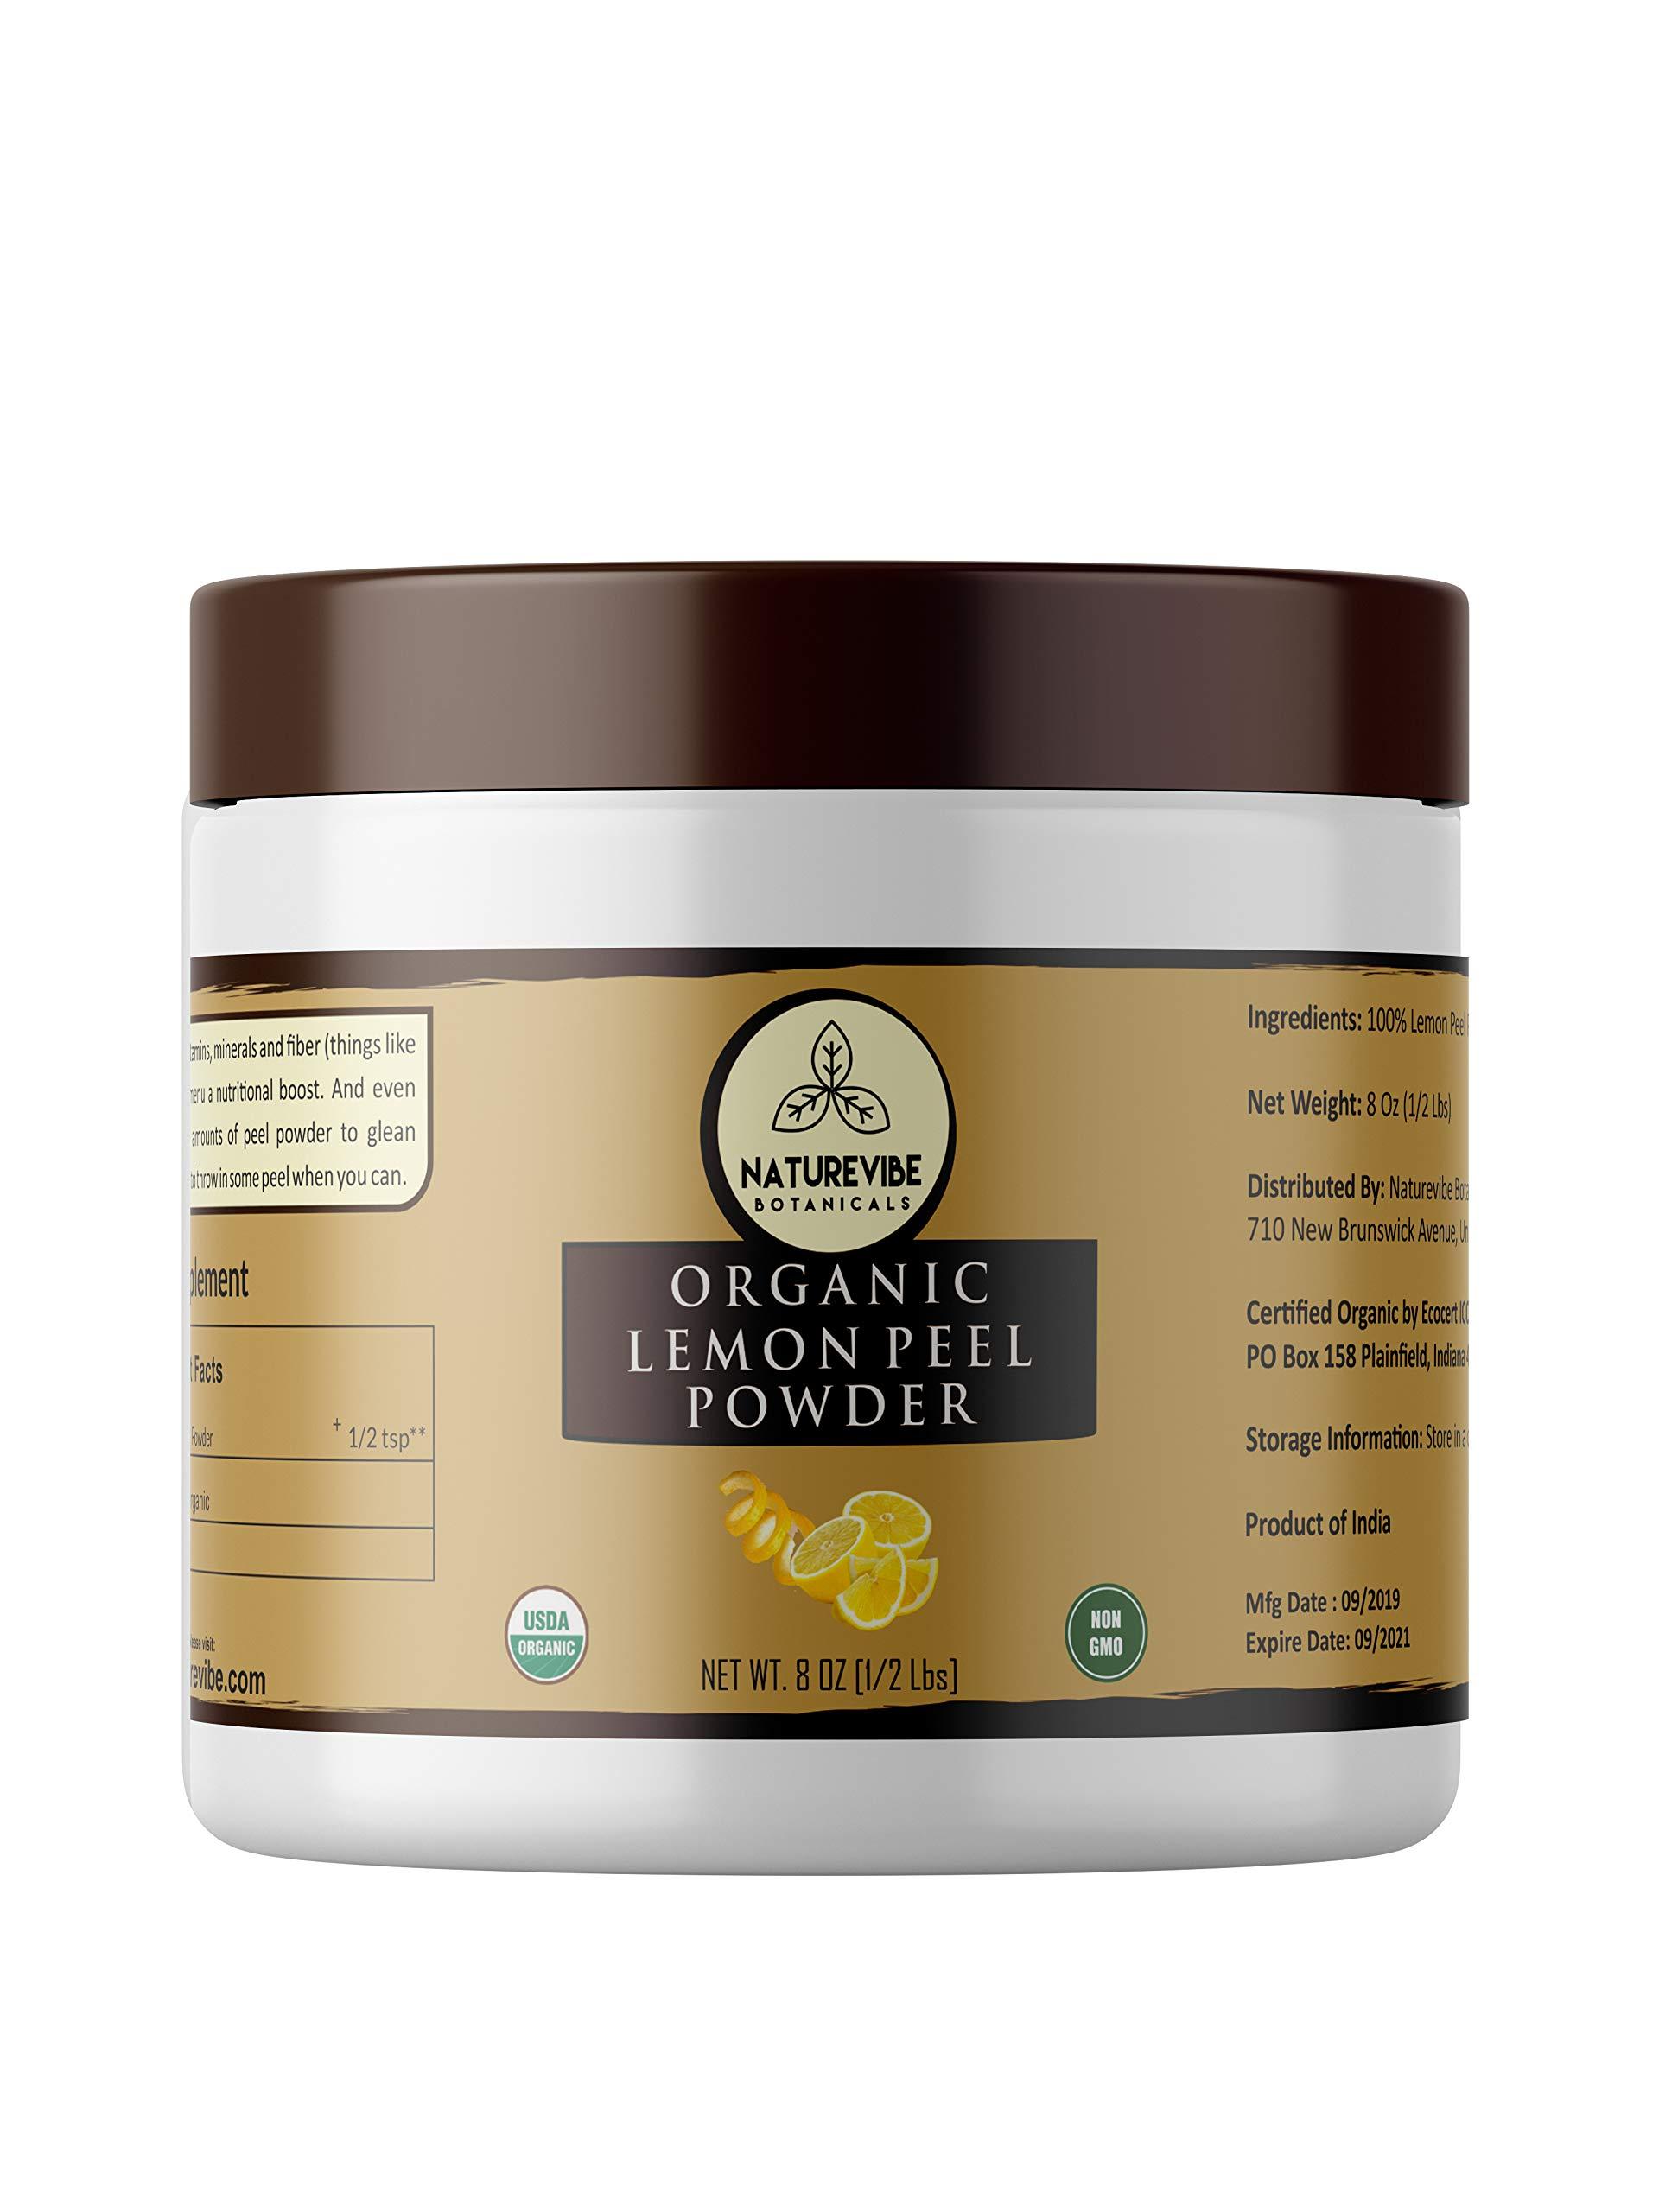 Naturevibe Botanicals USDA Organic Lemon Peel Powder (8 Ounces) - Citrus Lemon - 100% Pure & Natural.[Packaging May Vary]